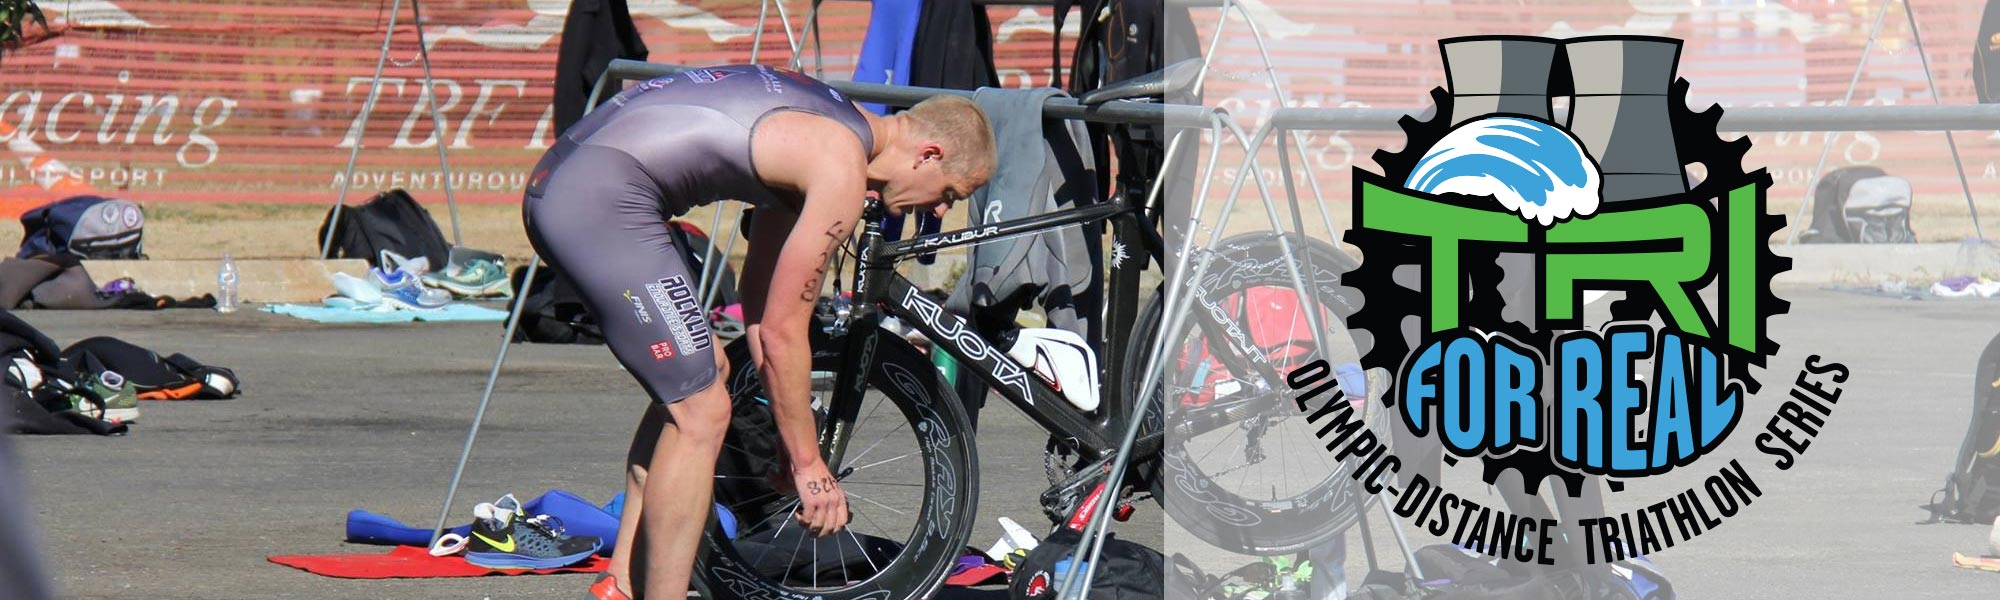 The Tri for Real Triathlon #2, Aqua Bike, 1 2m/2 4m OW Swim